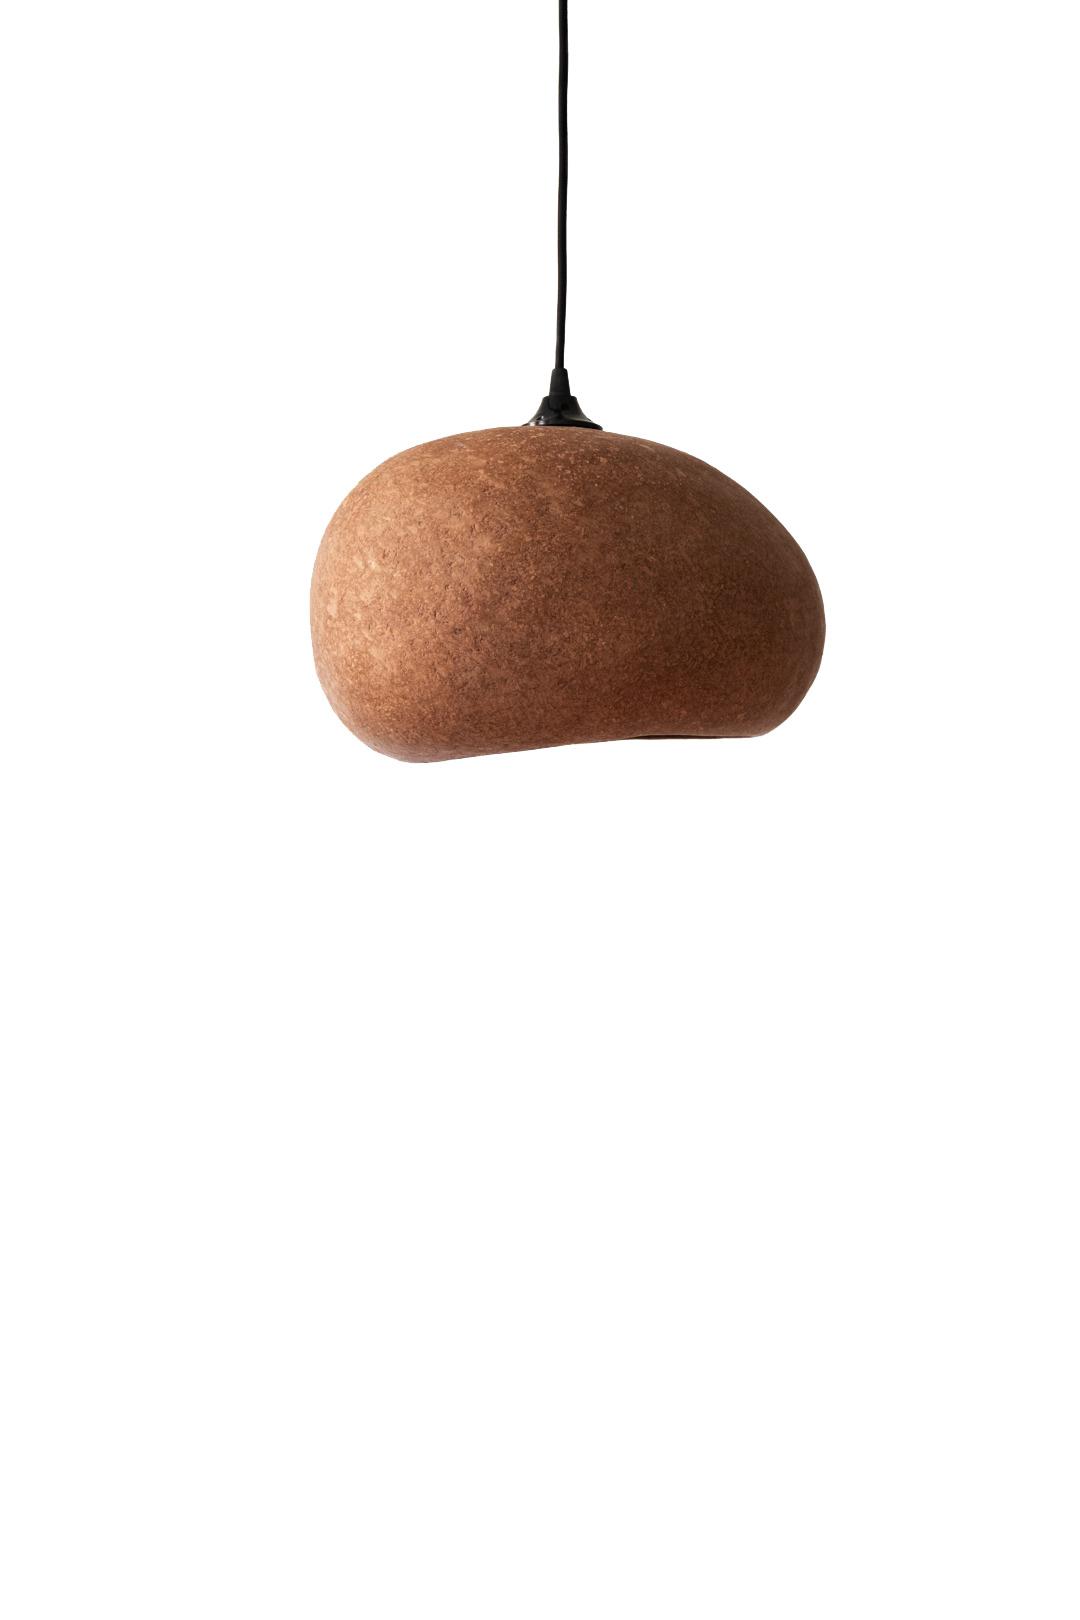 Ay Illuminate Lampe Suspension en Terracotta M - carton recyclé - 36x27x19cm - Ay illuminate